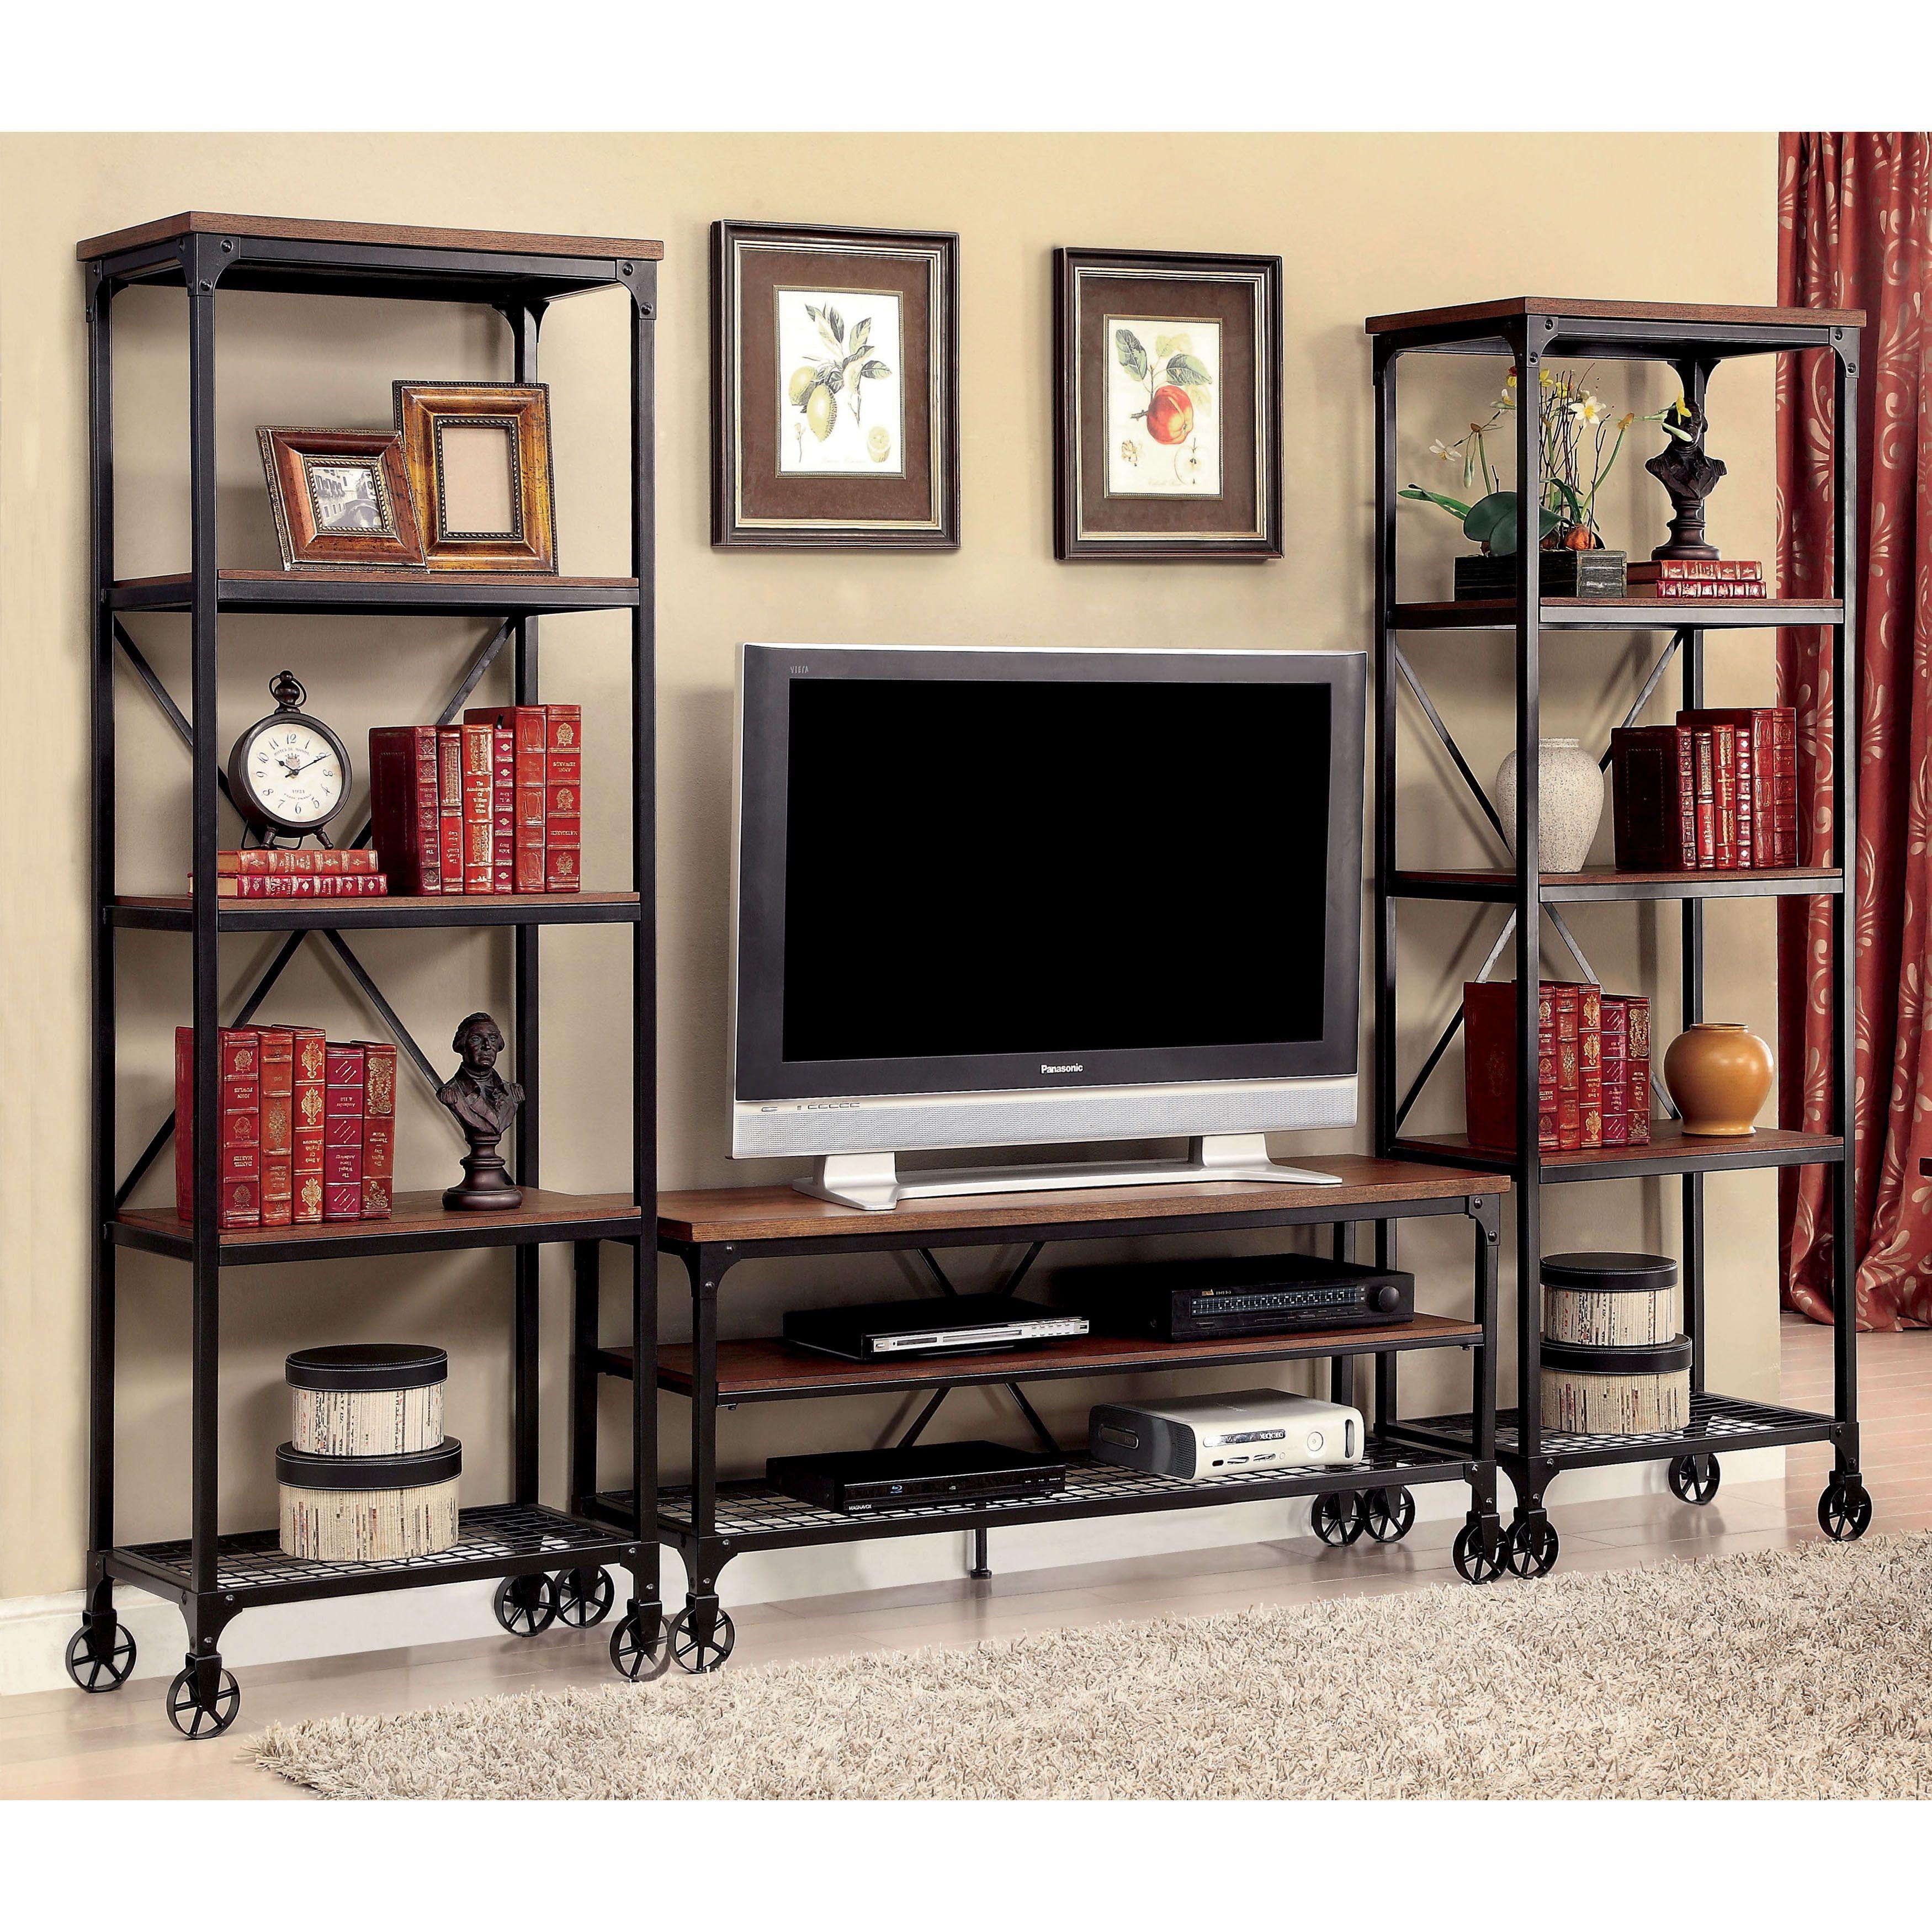 Furniture of america daimon industrial 3 piece medium oak 54 inch entertainment unit